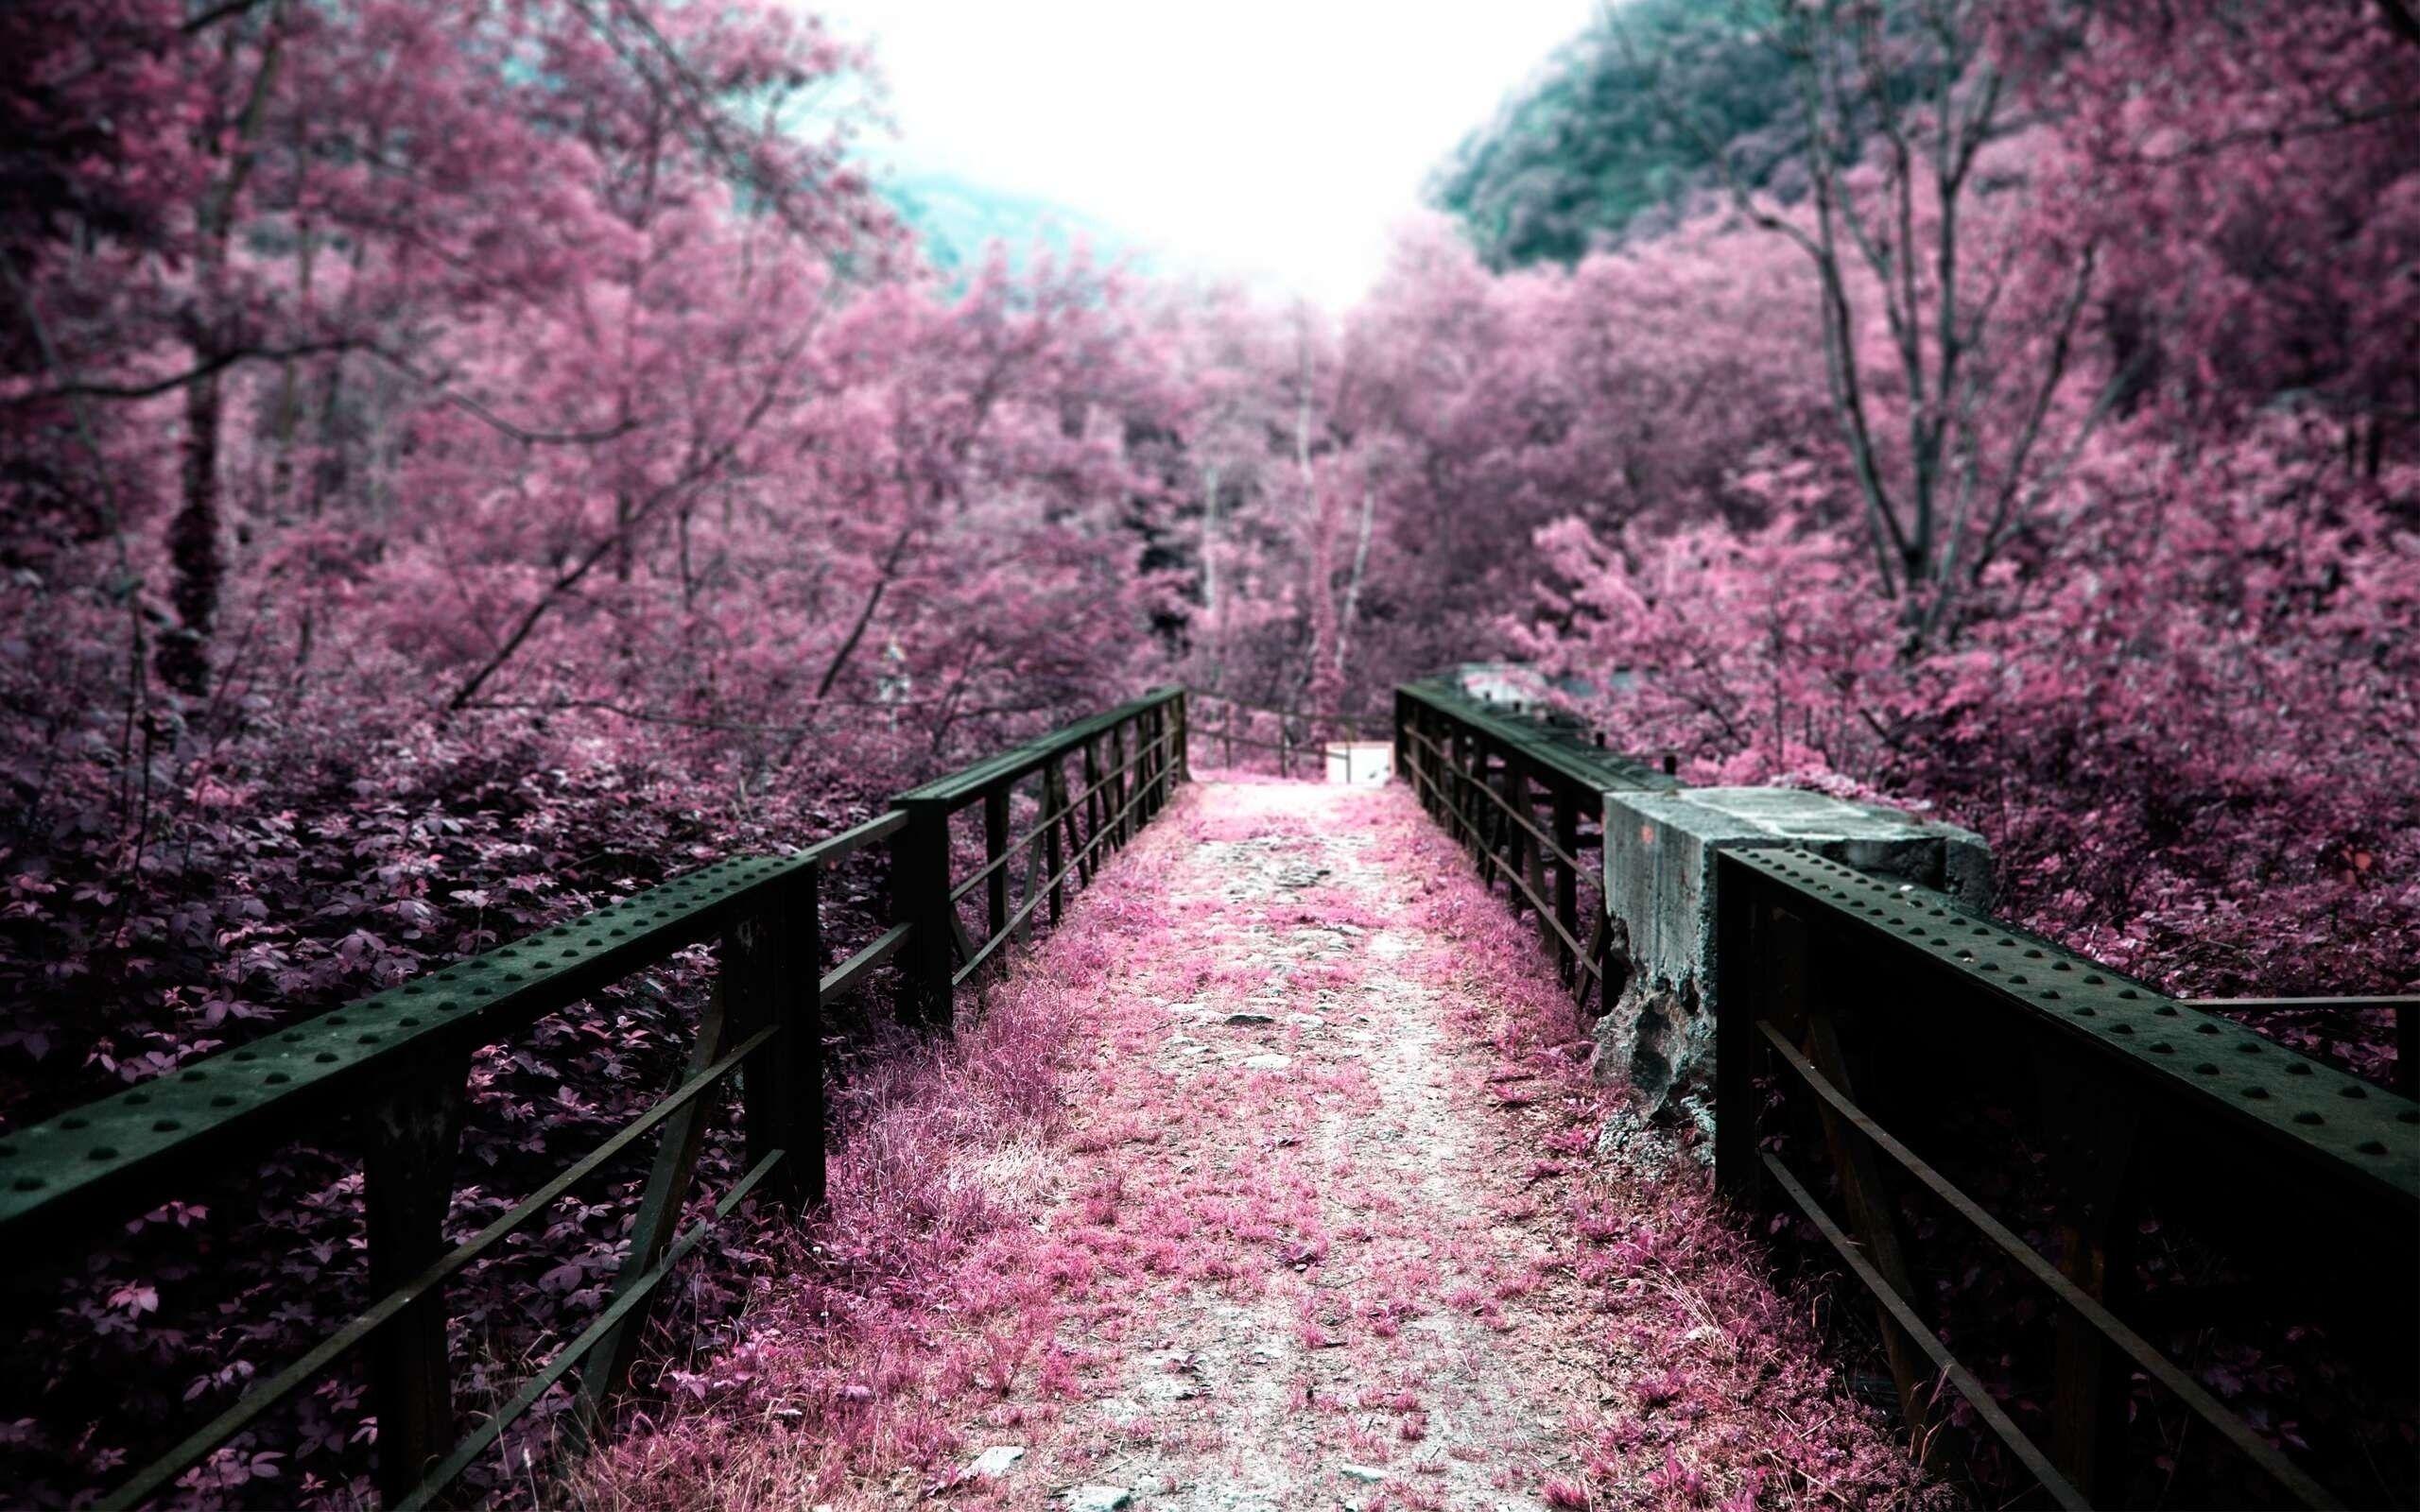 Japan Sakura Flowers HD Wallpapers - High Definition Wallpapers